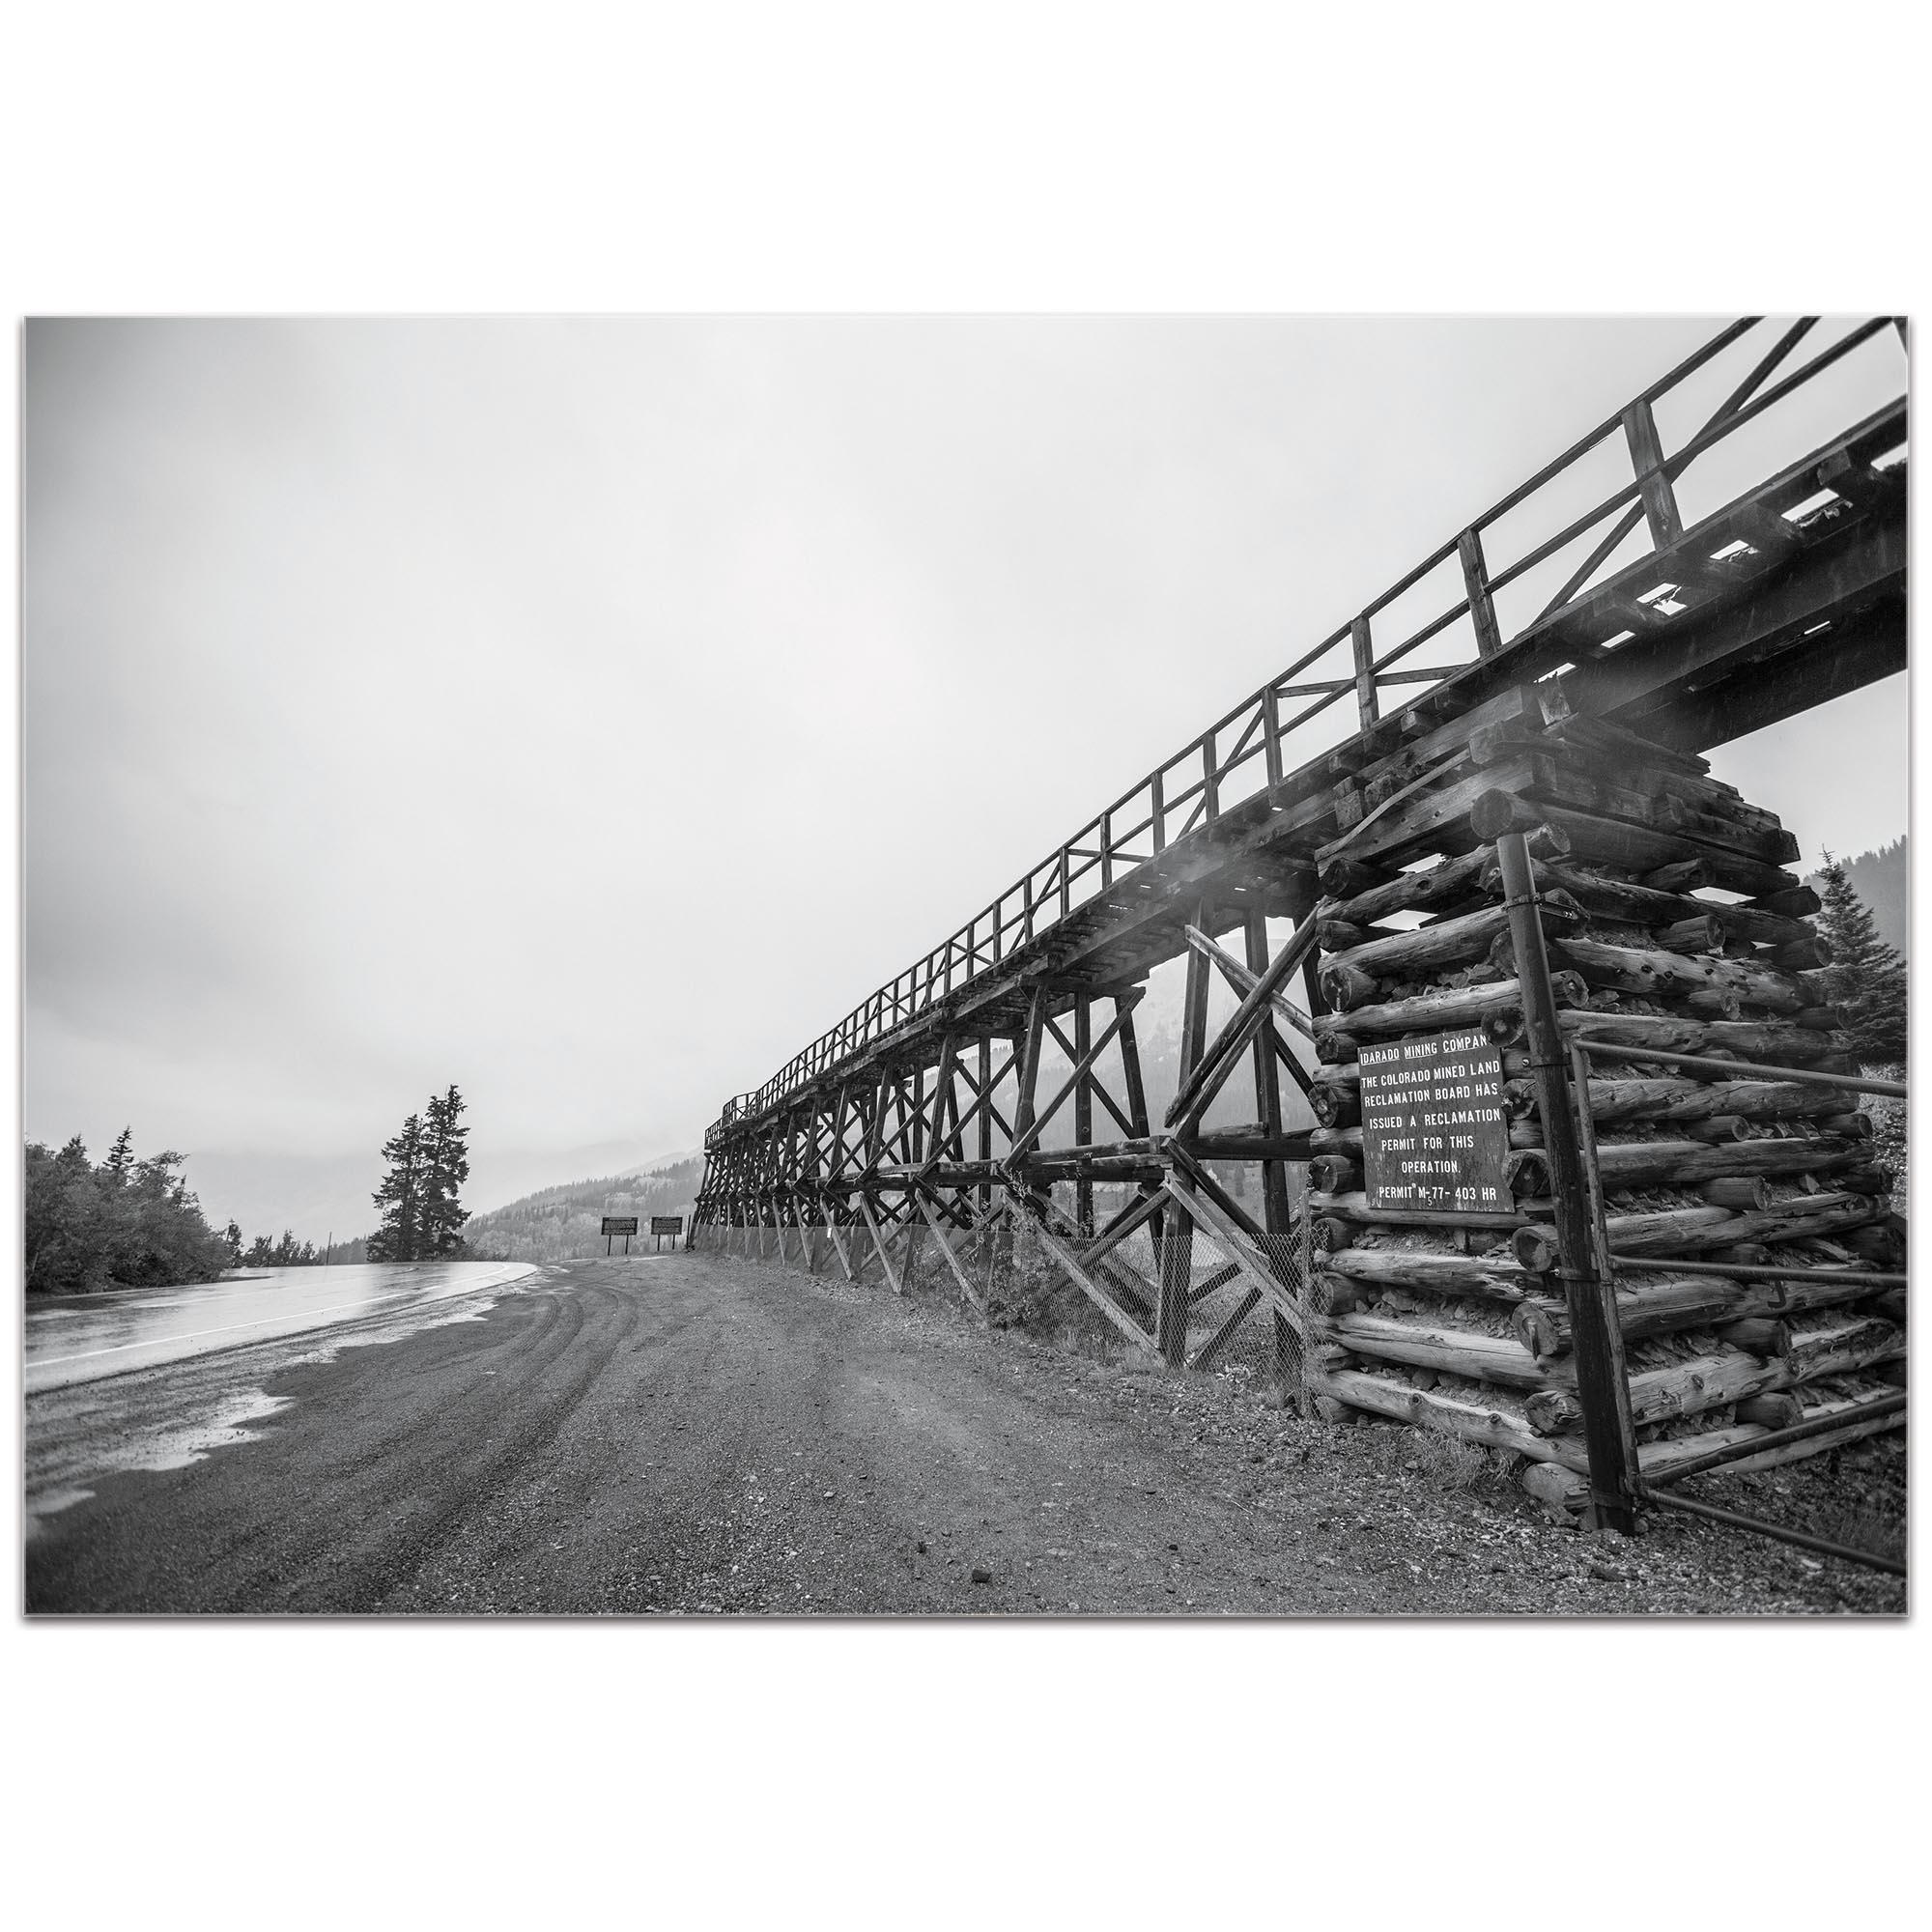 Western Wall Art 'Old Railroad Bridge' - Bridges Decor on Metal or Plexiglass - Image 2